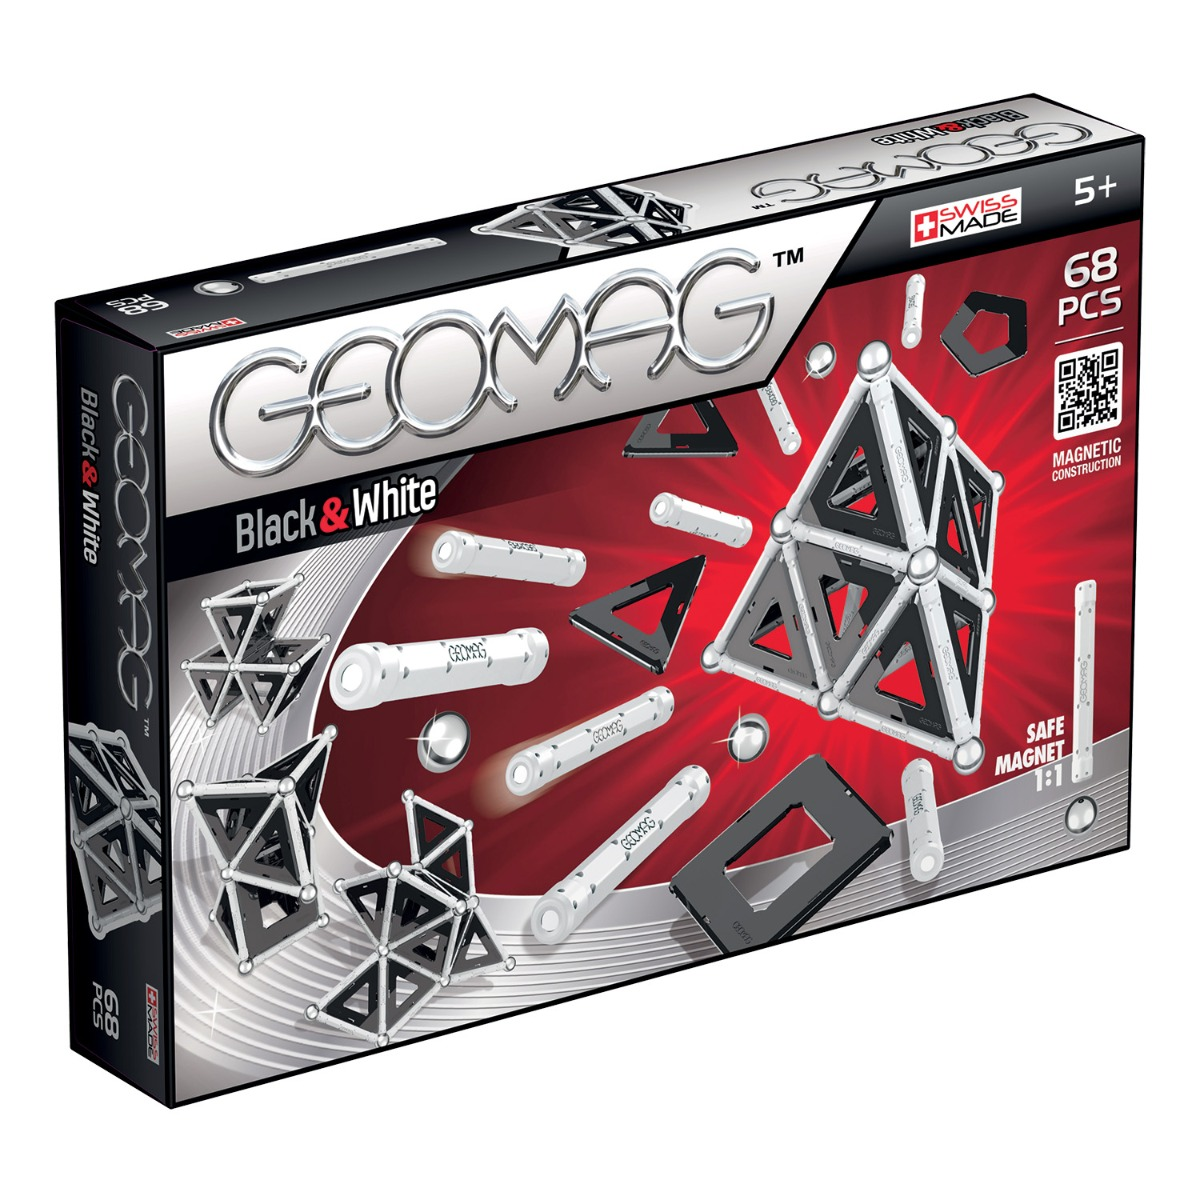 Joc de constructie magnetic Geomag Black and White, 68 piese imagine